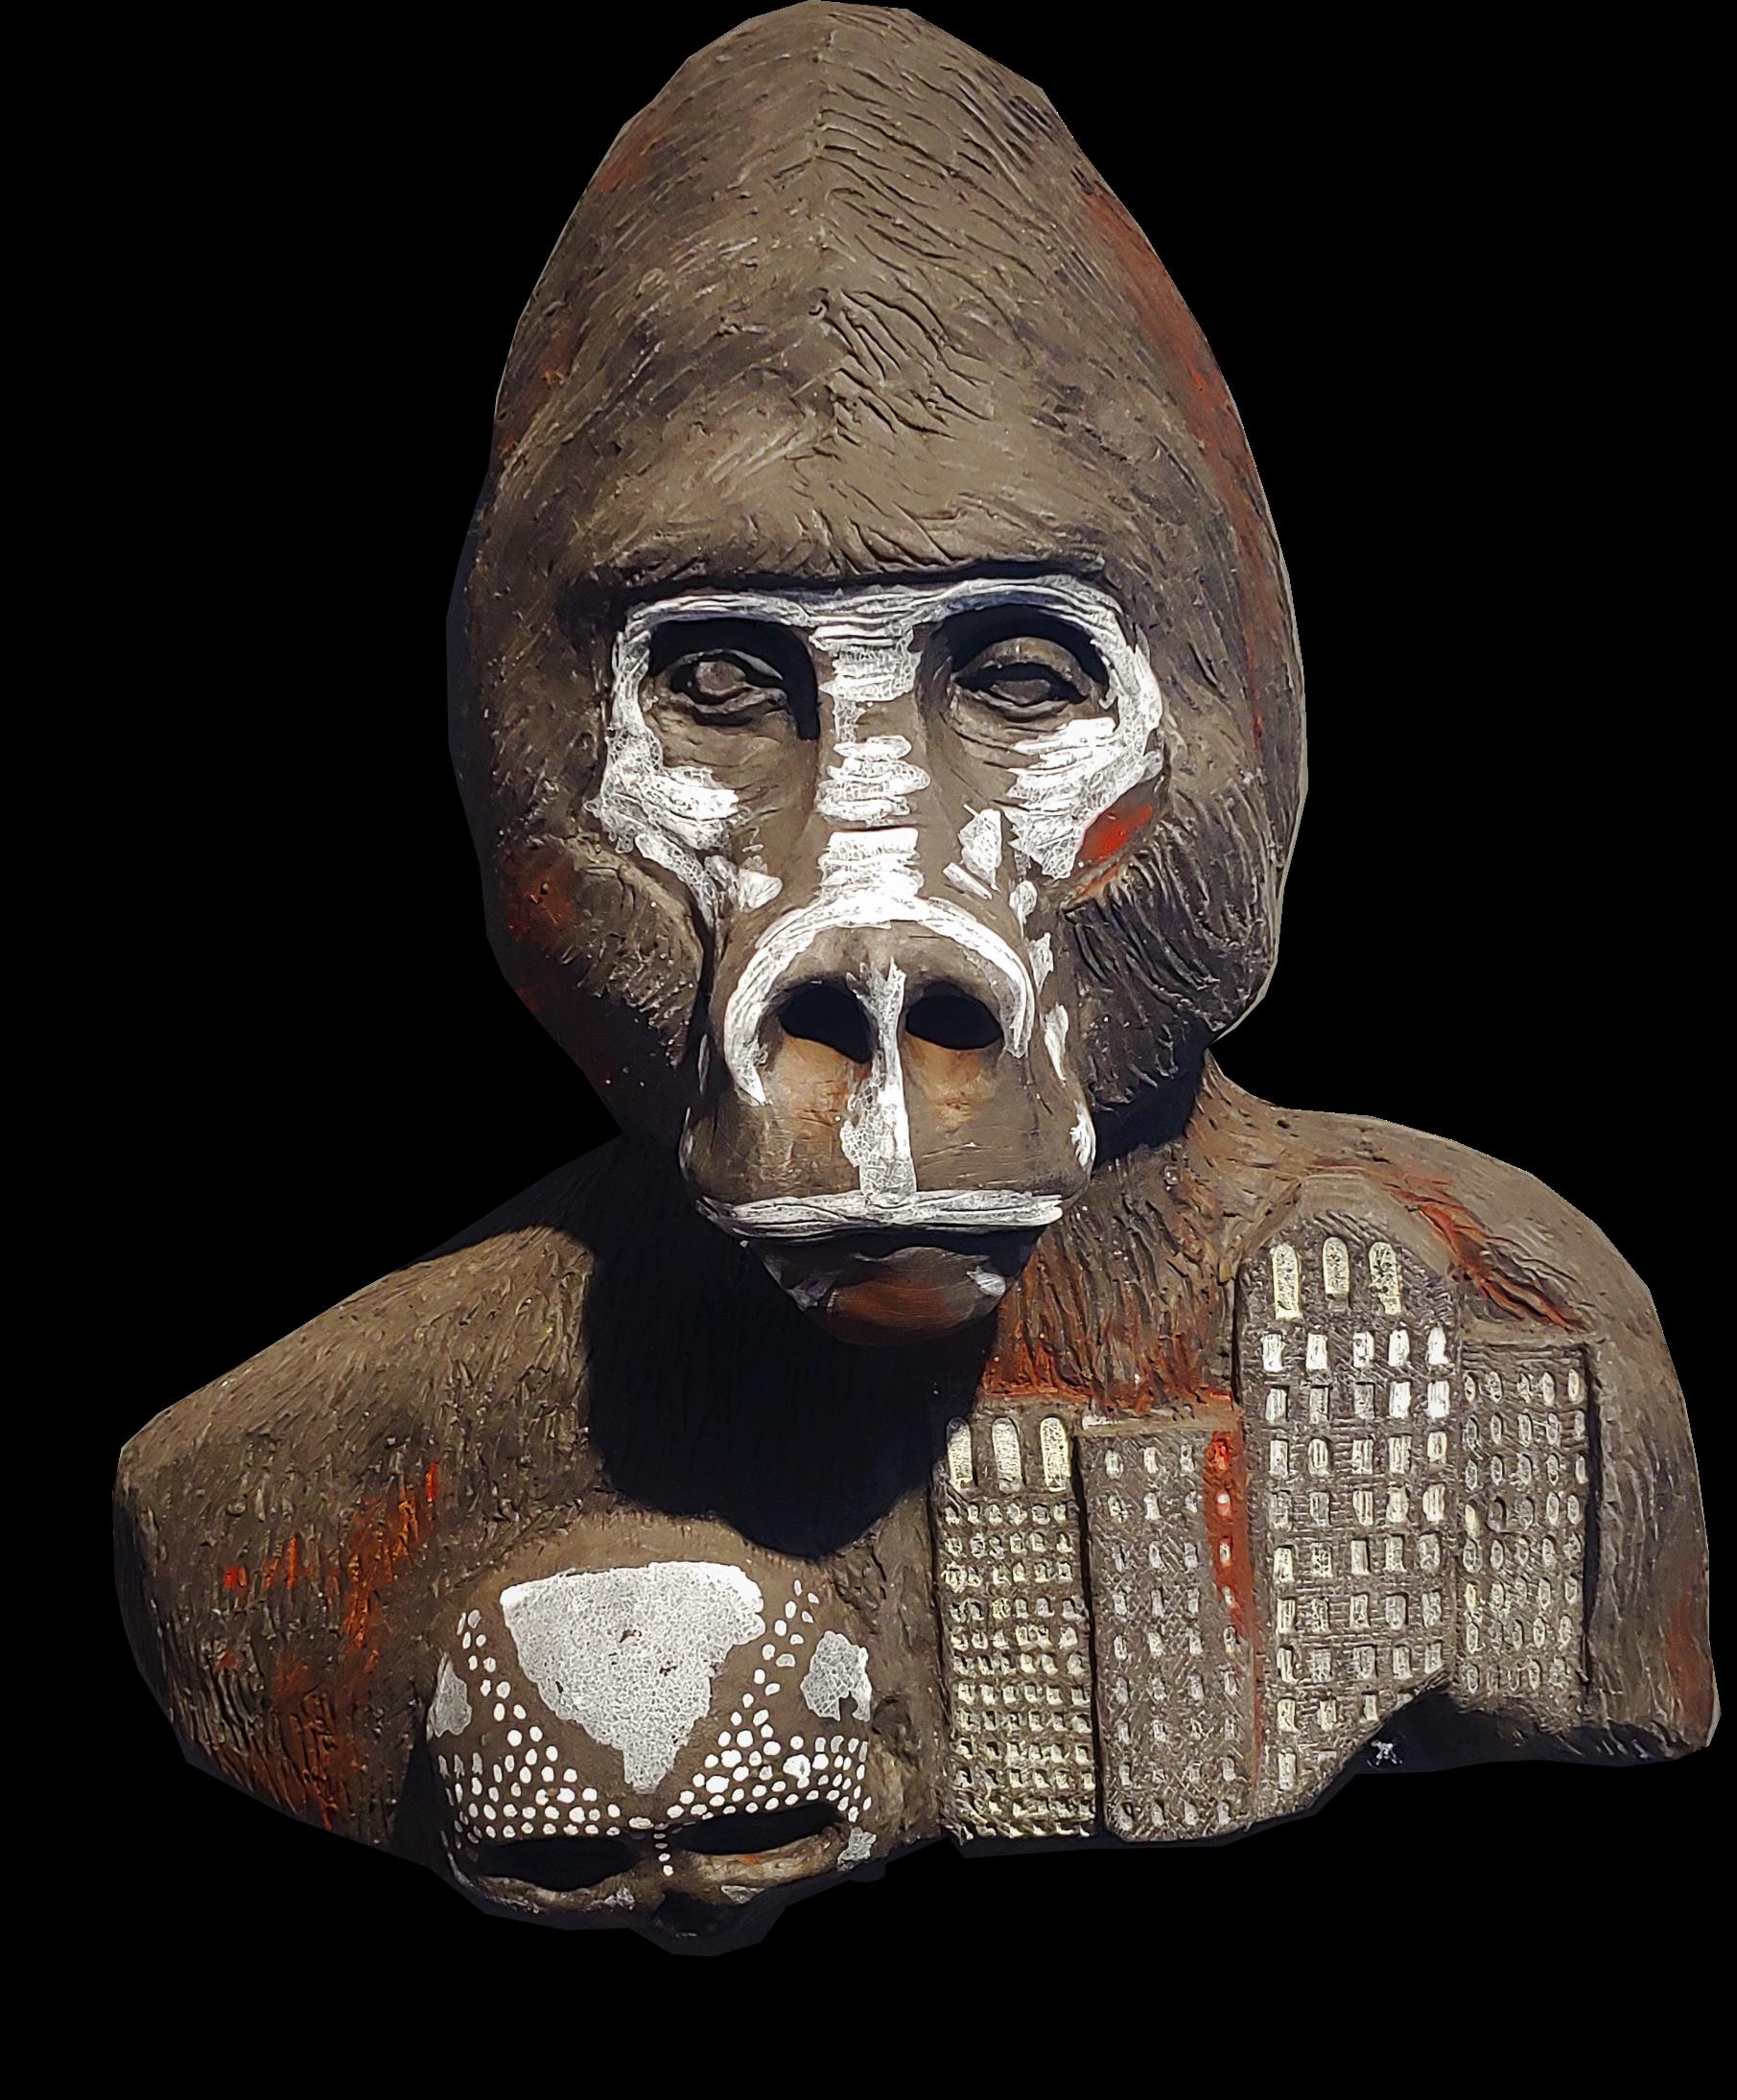 Hannah gorilla for web nw4rfb